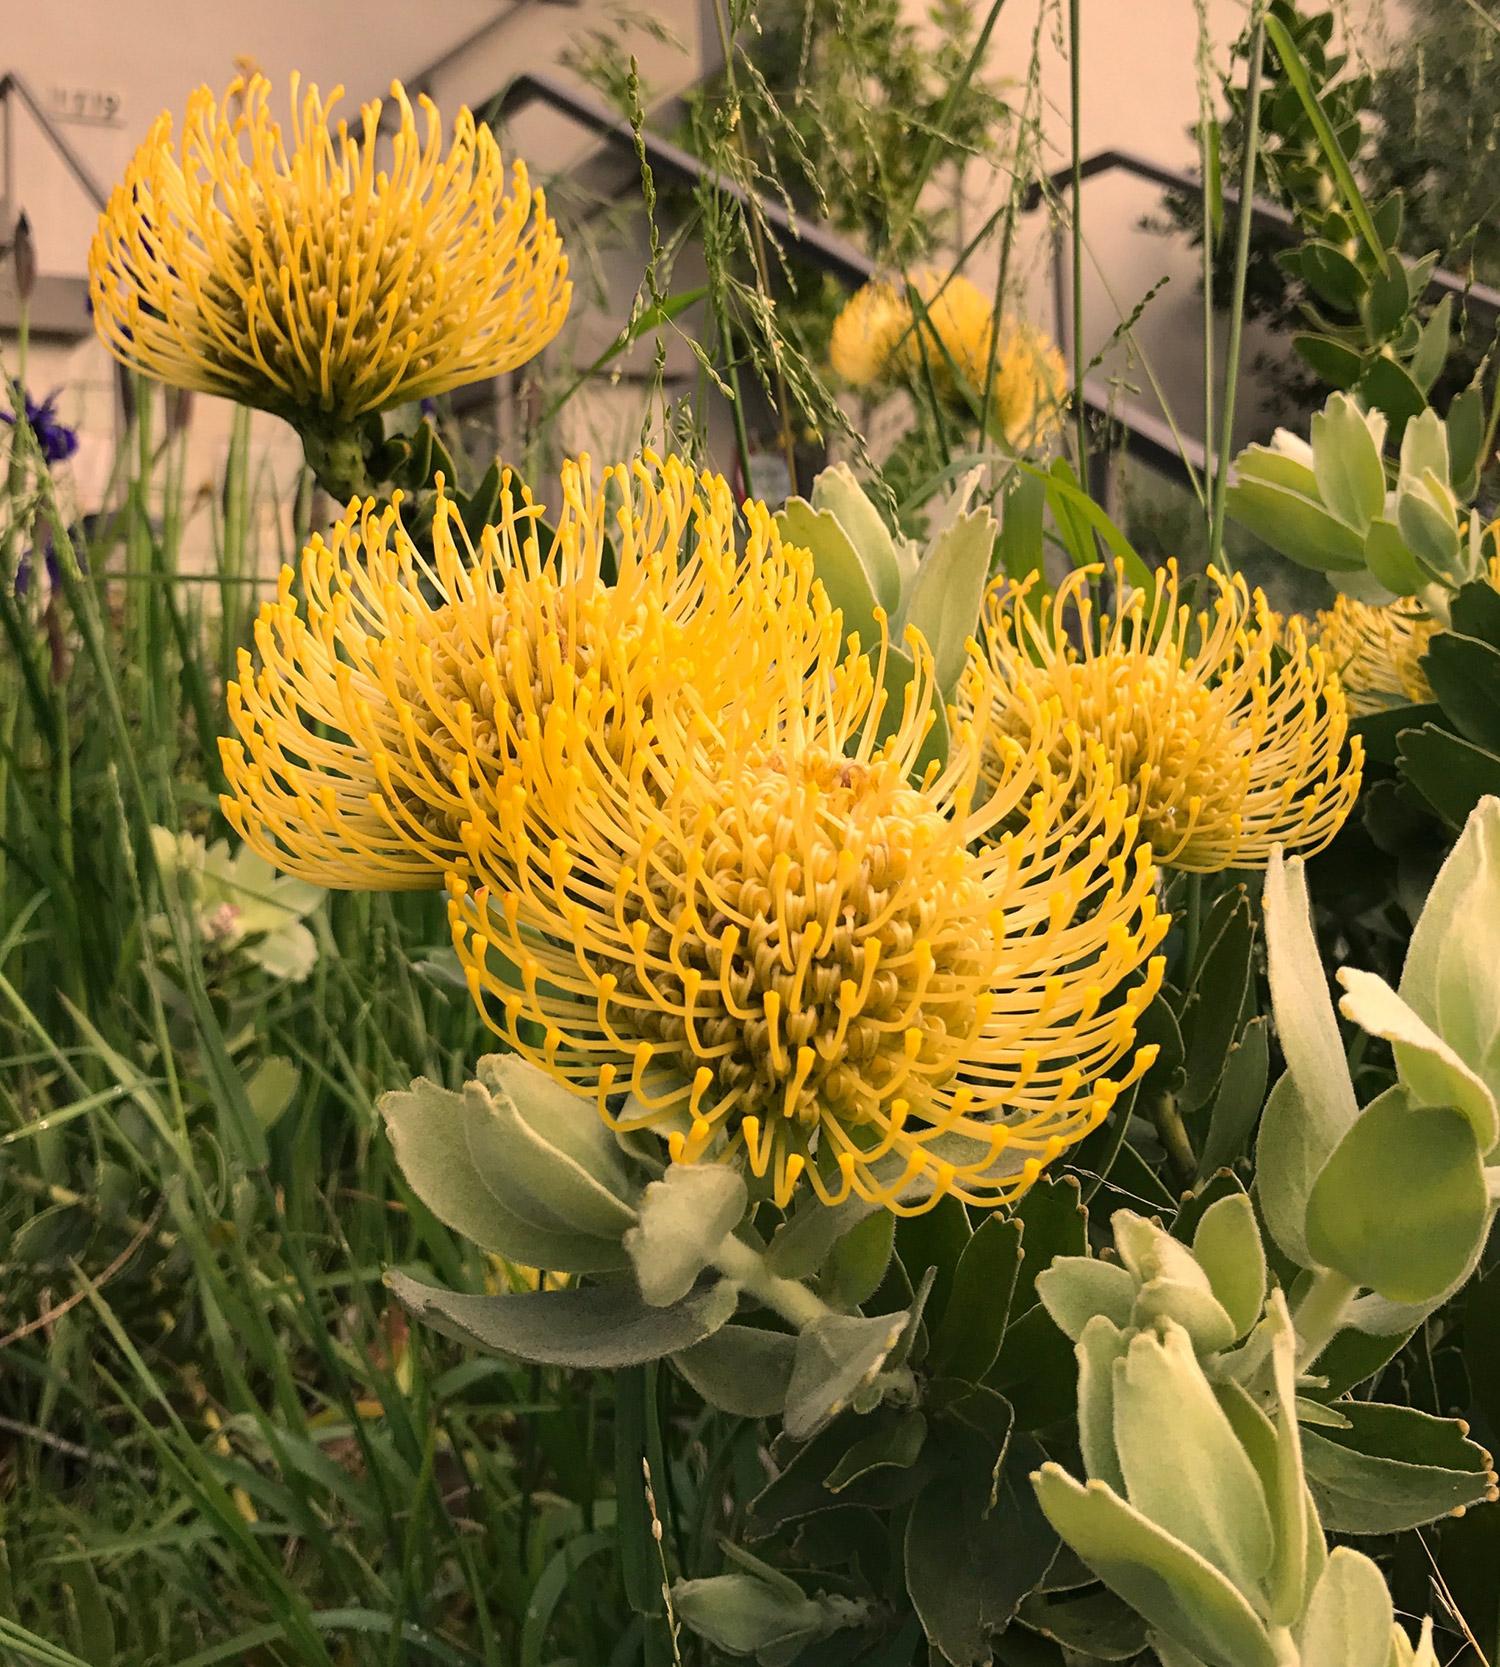 yellow-flowers-in-berkeley-ca-photo-by-kathryn-beam-troxler-IMG_1539.jpg